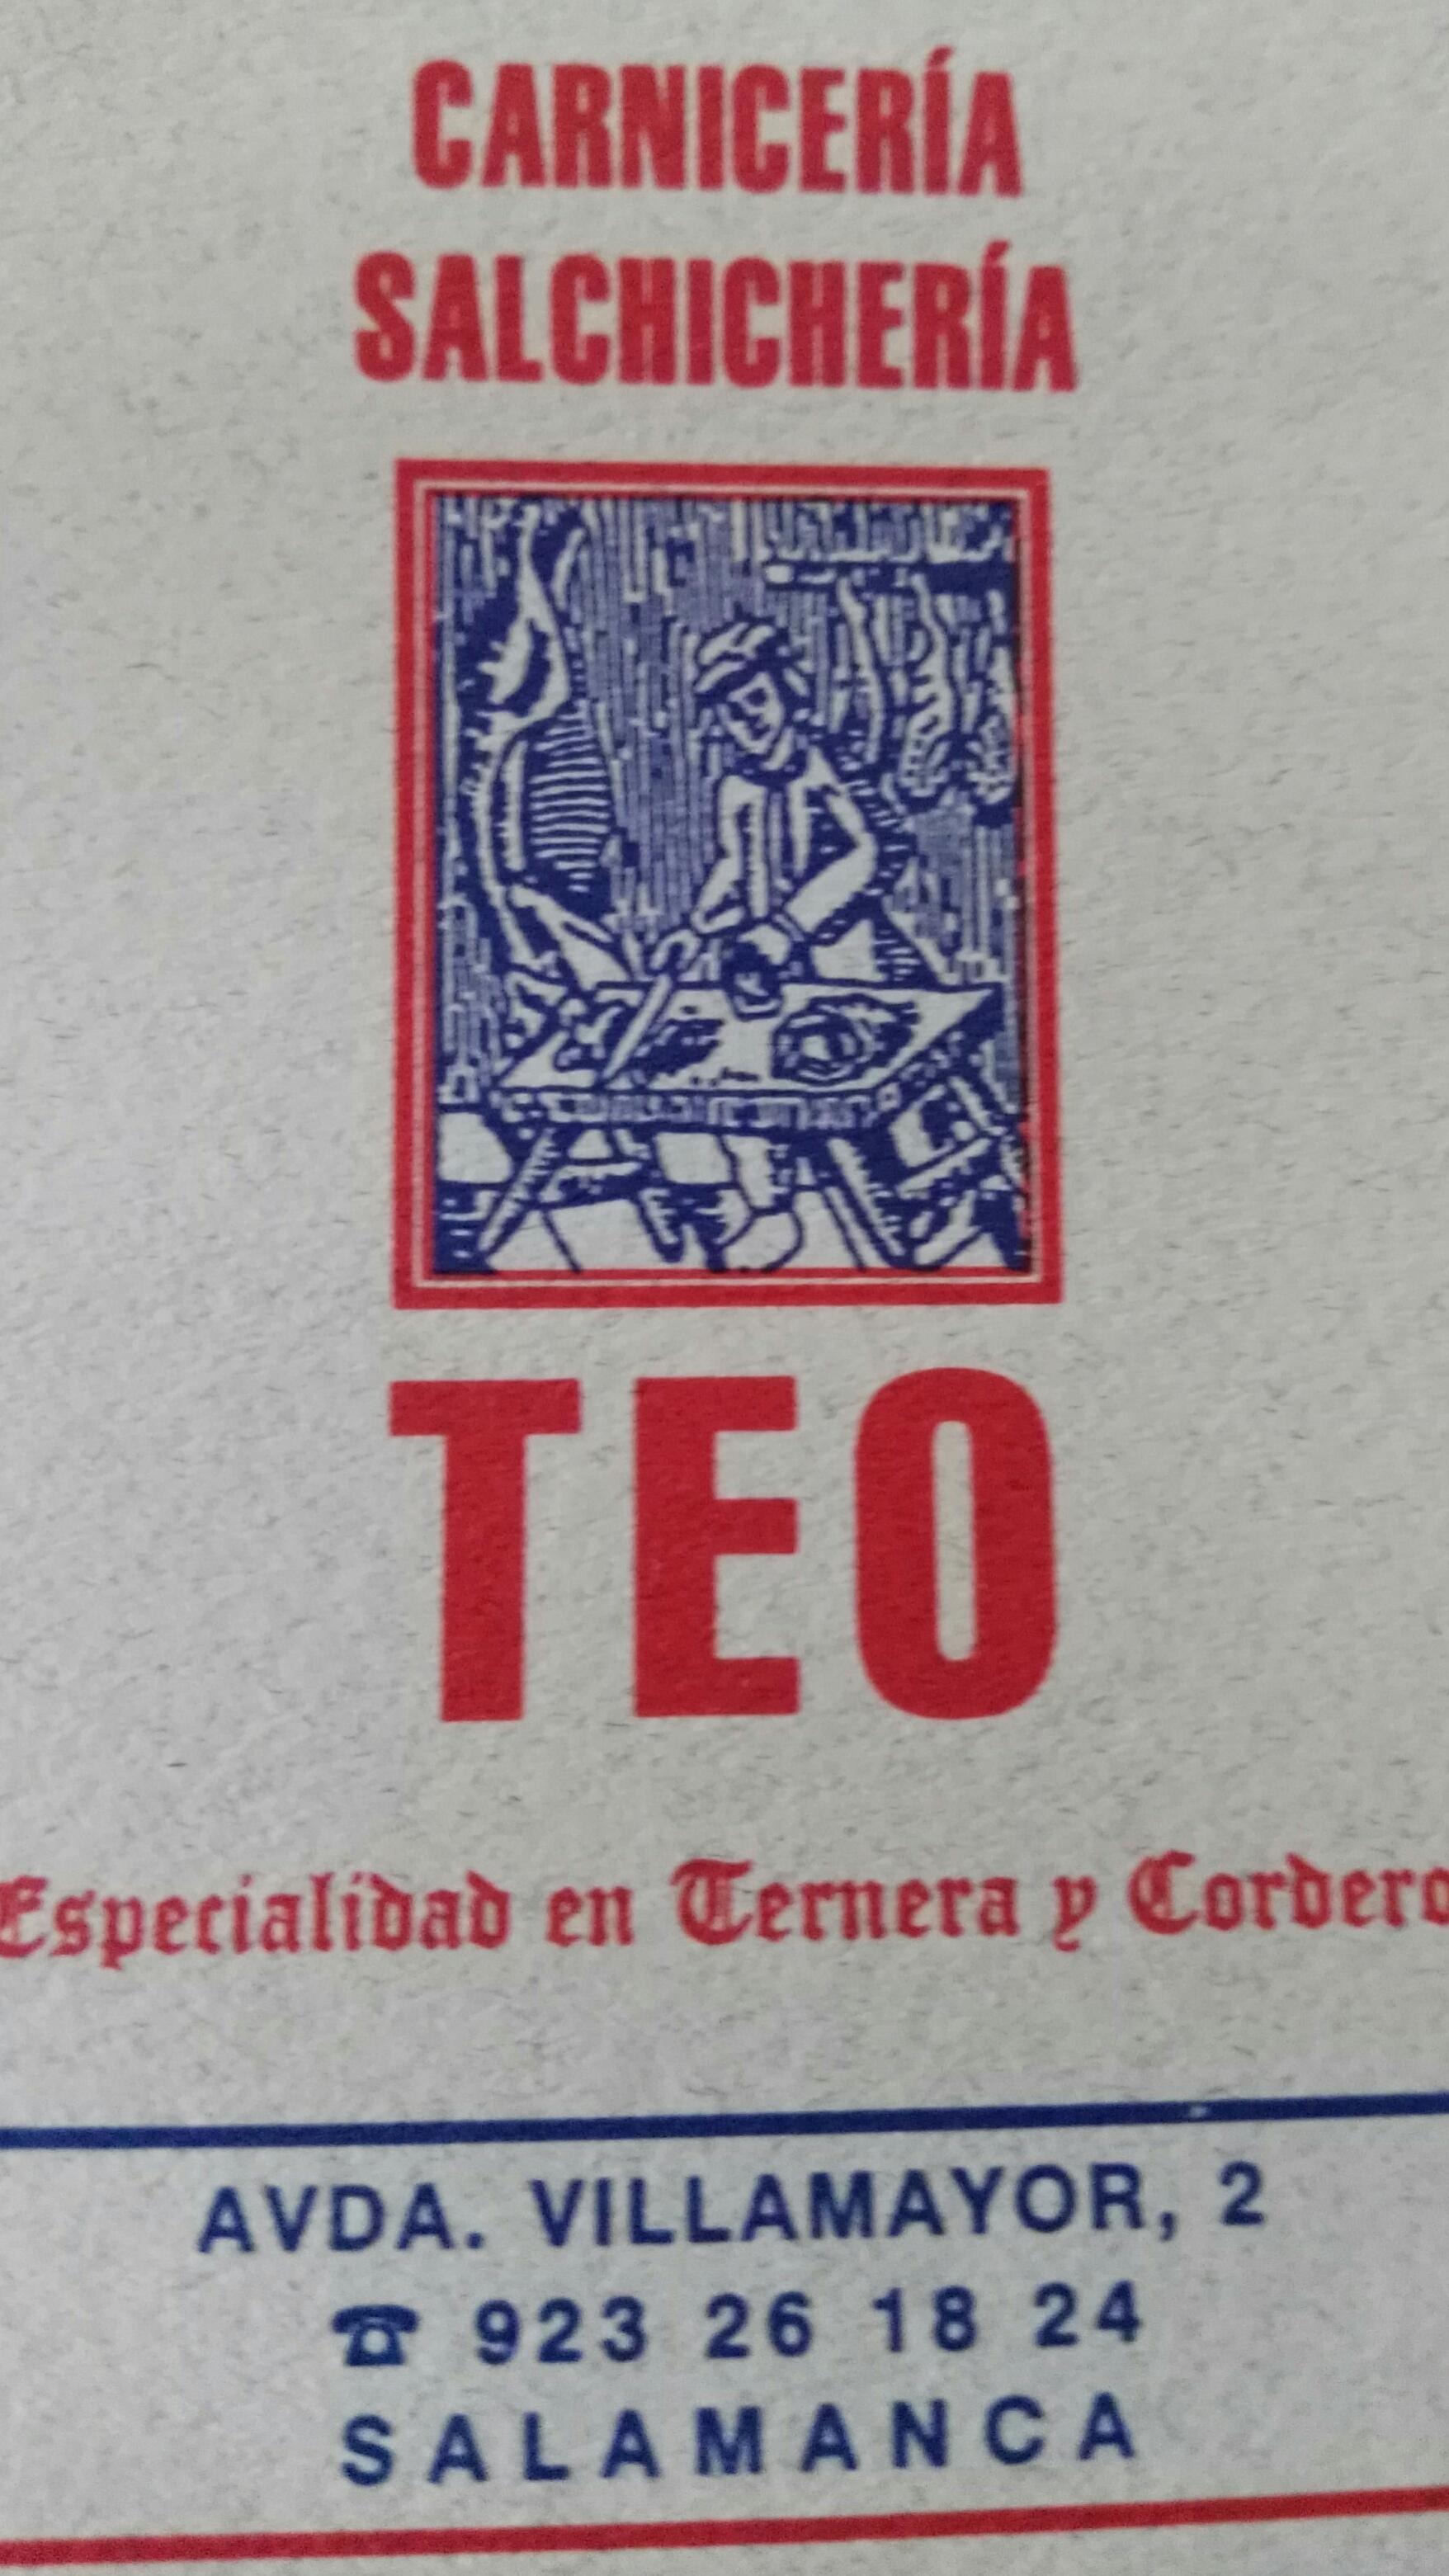 Logo comerç Carniceria Teo